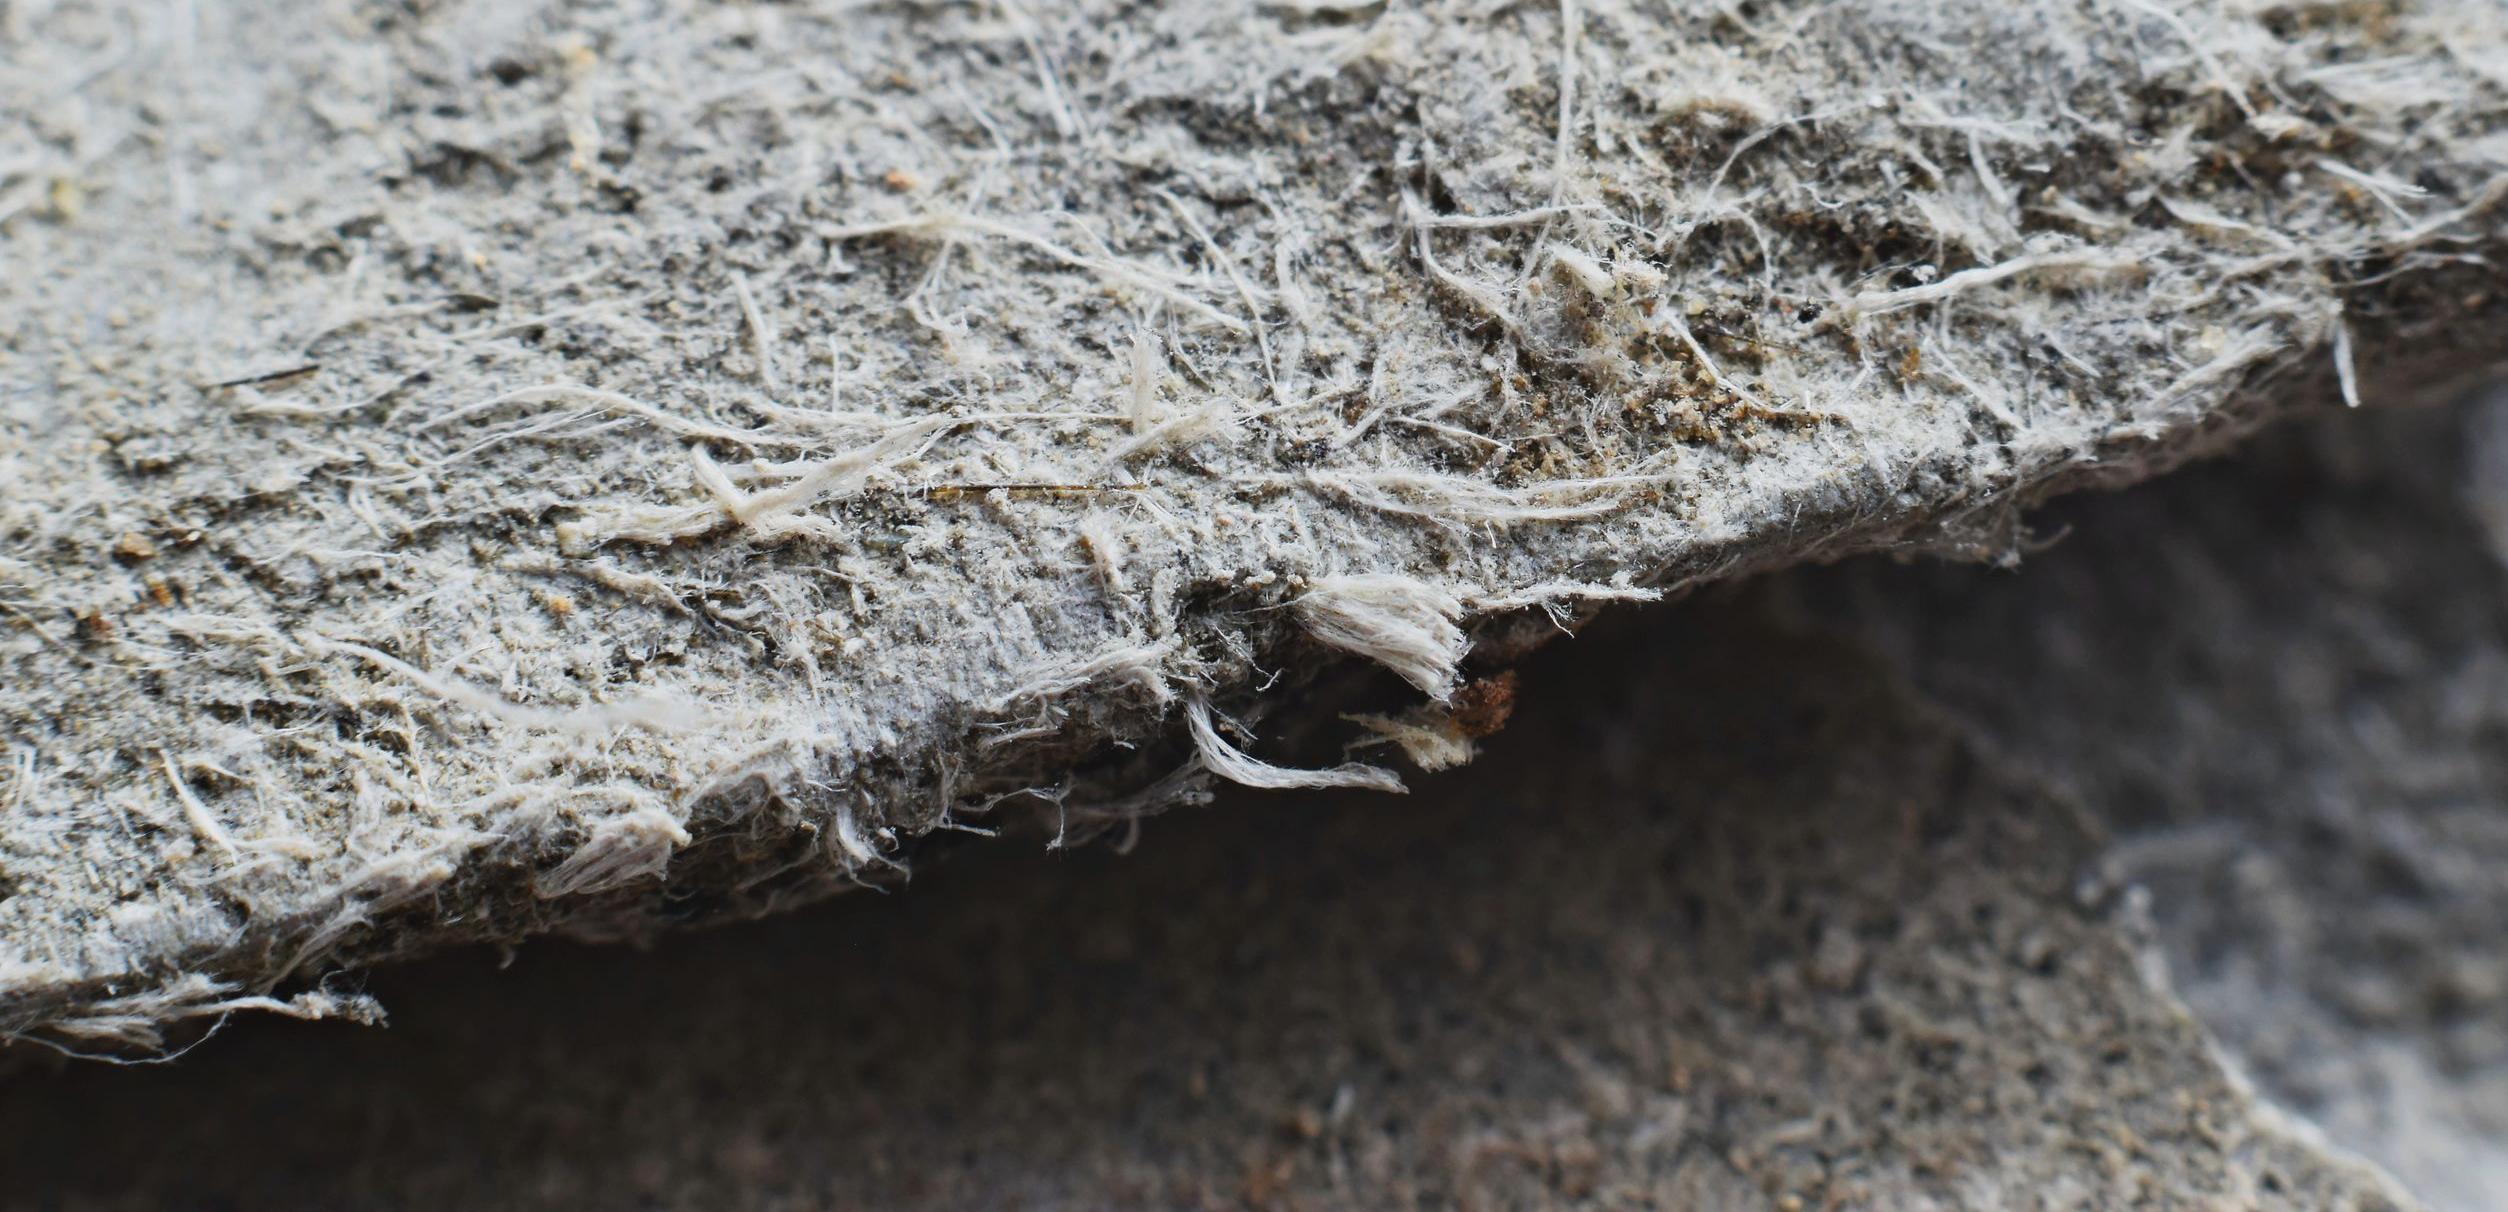 Asbestos fiber roofing material